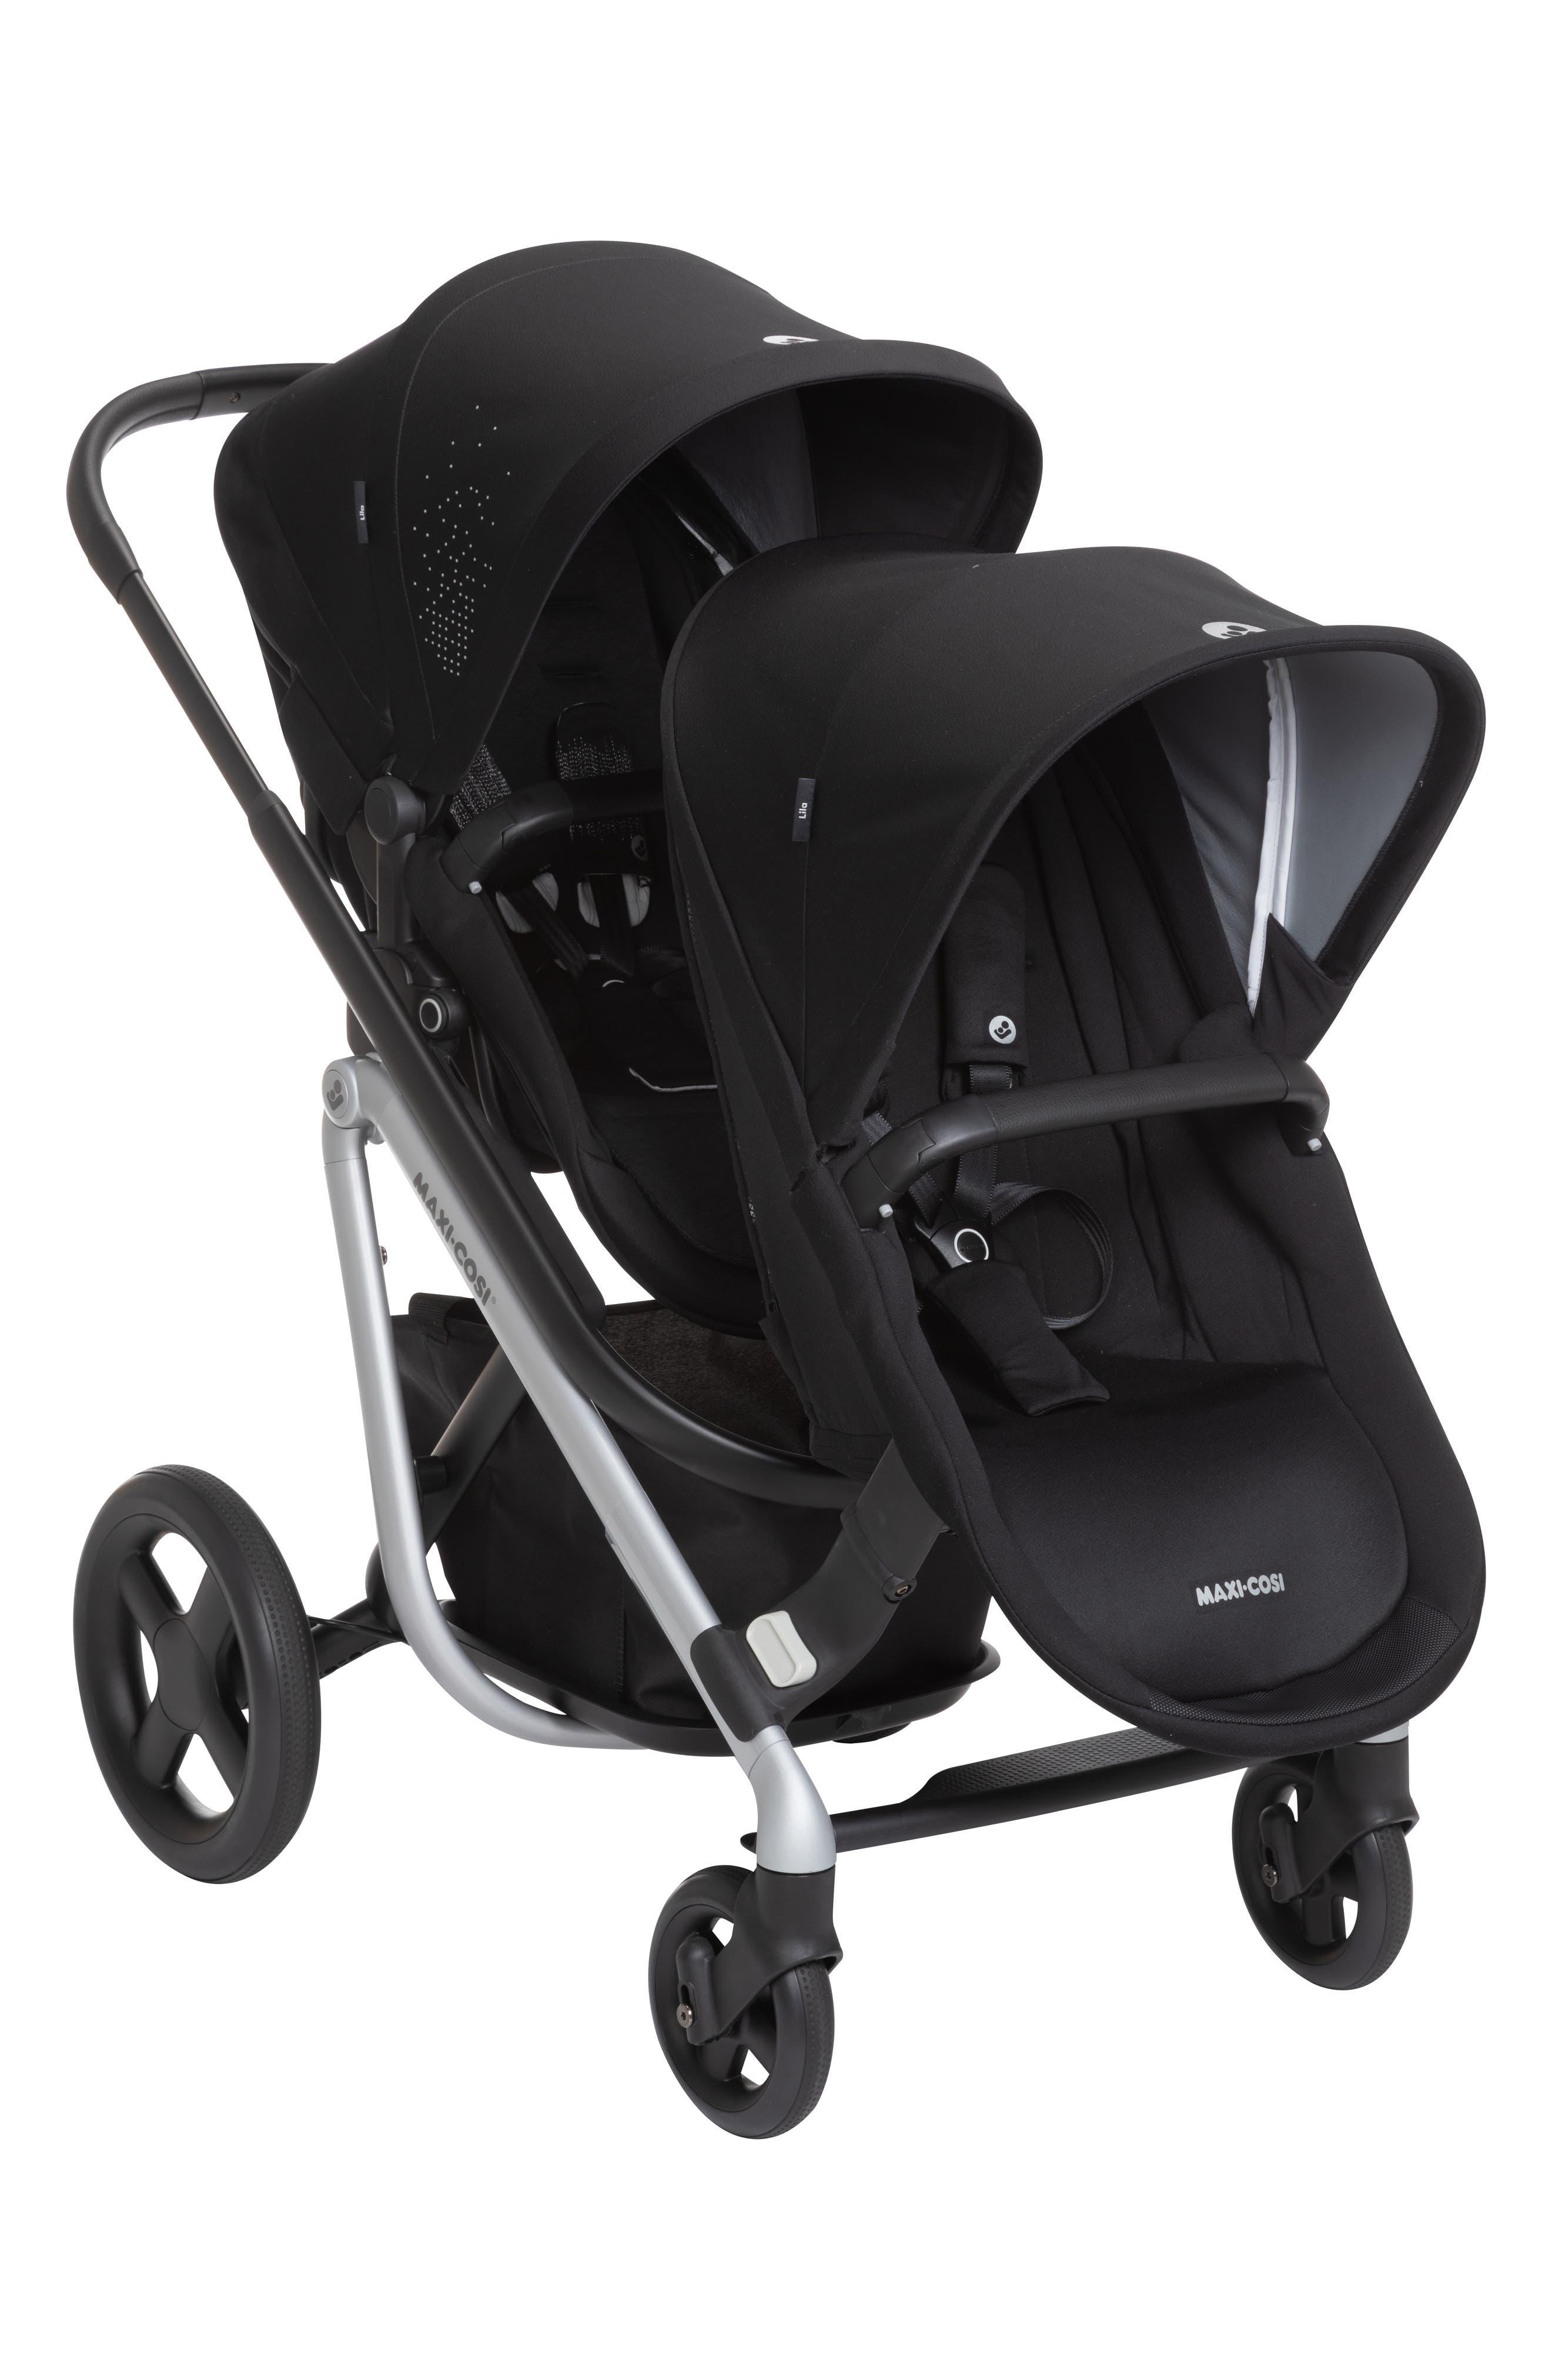 Infant MaxiCosi Lila Duo Sibling Seat Kit Size One Size  Black